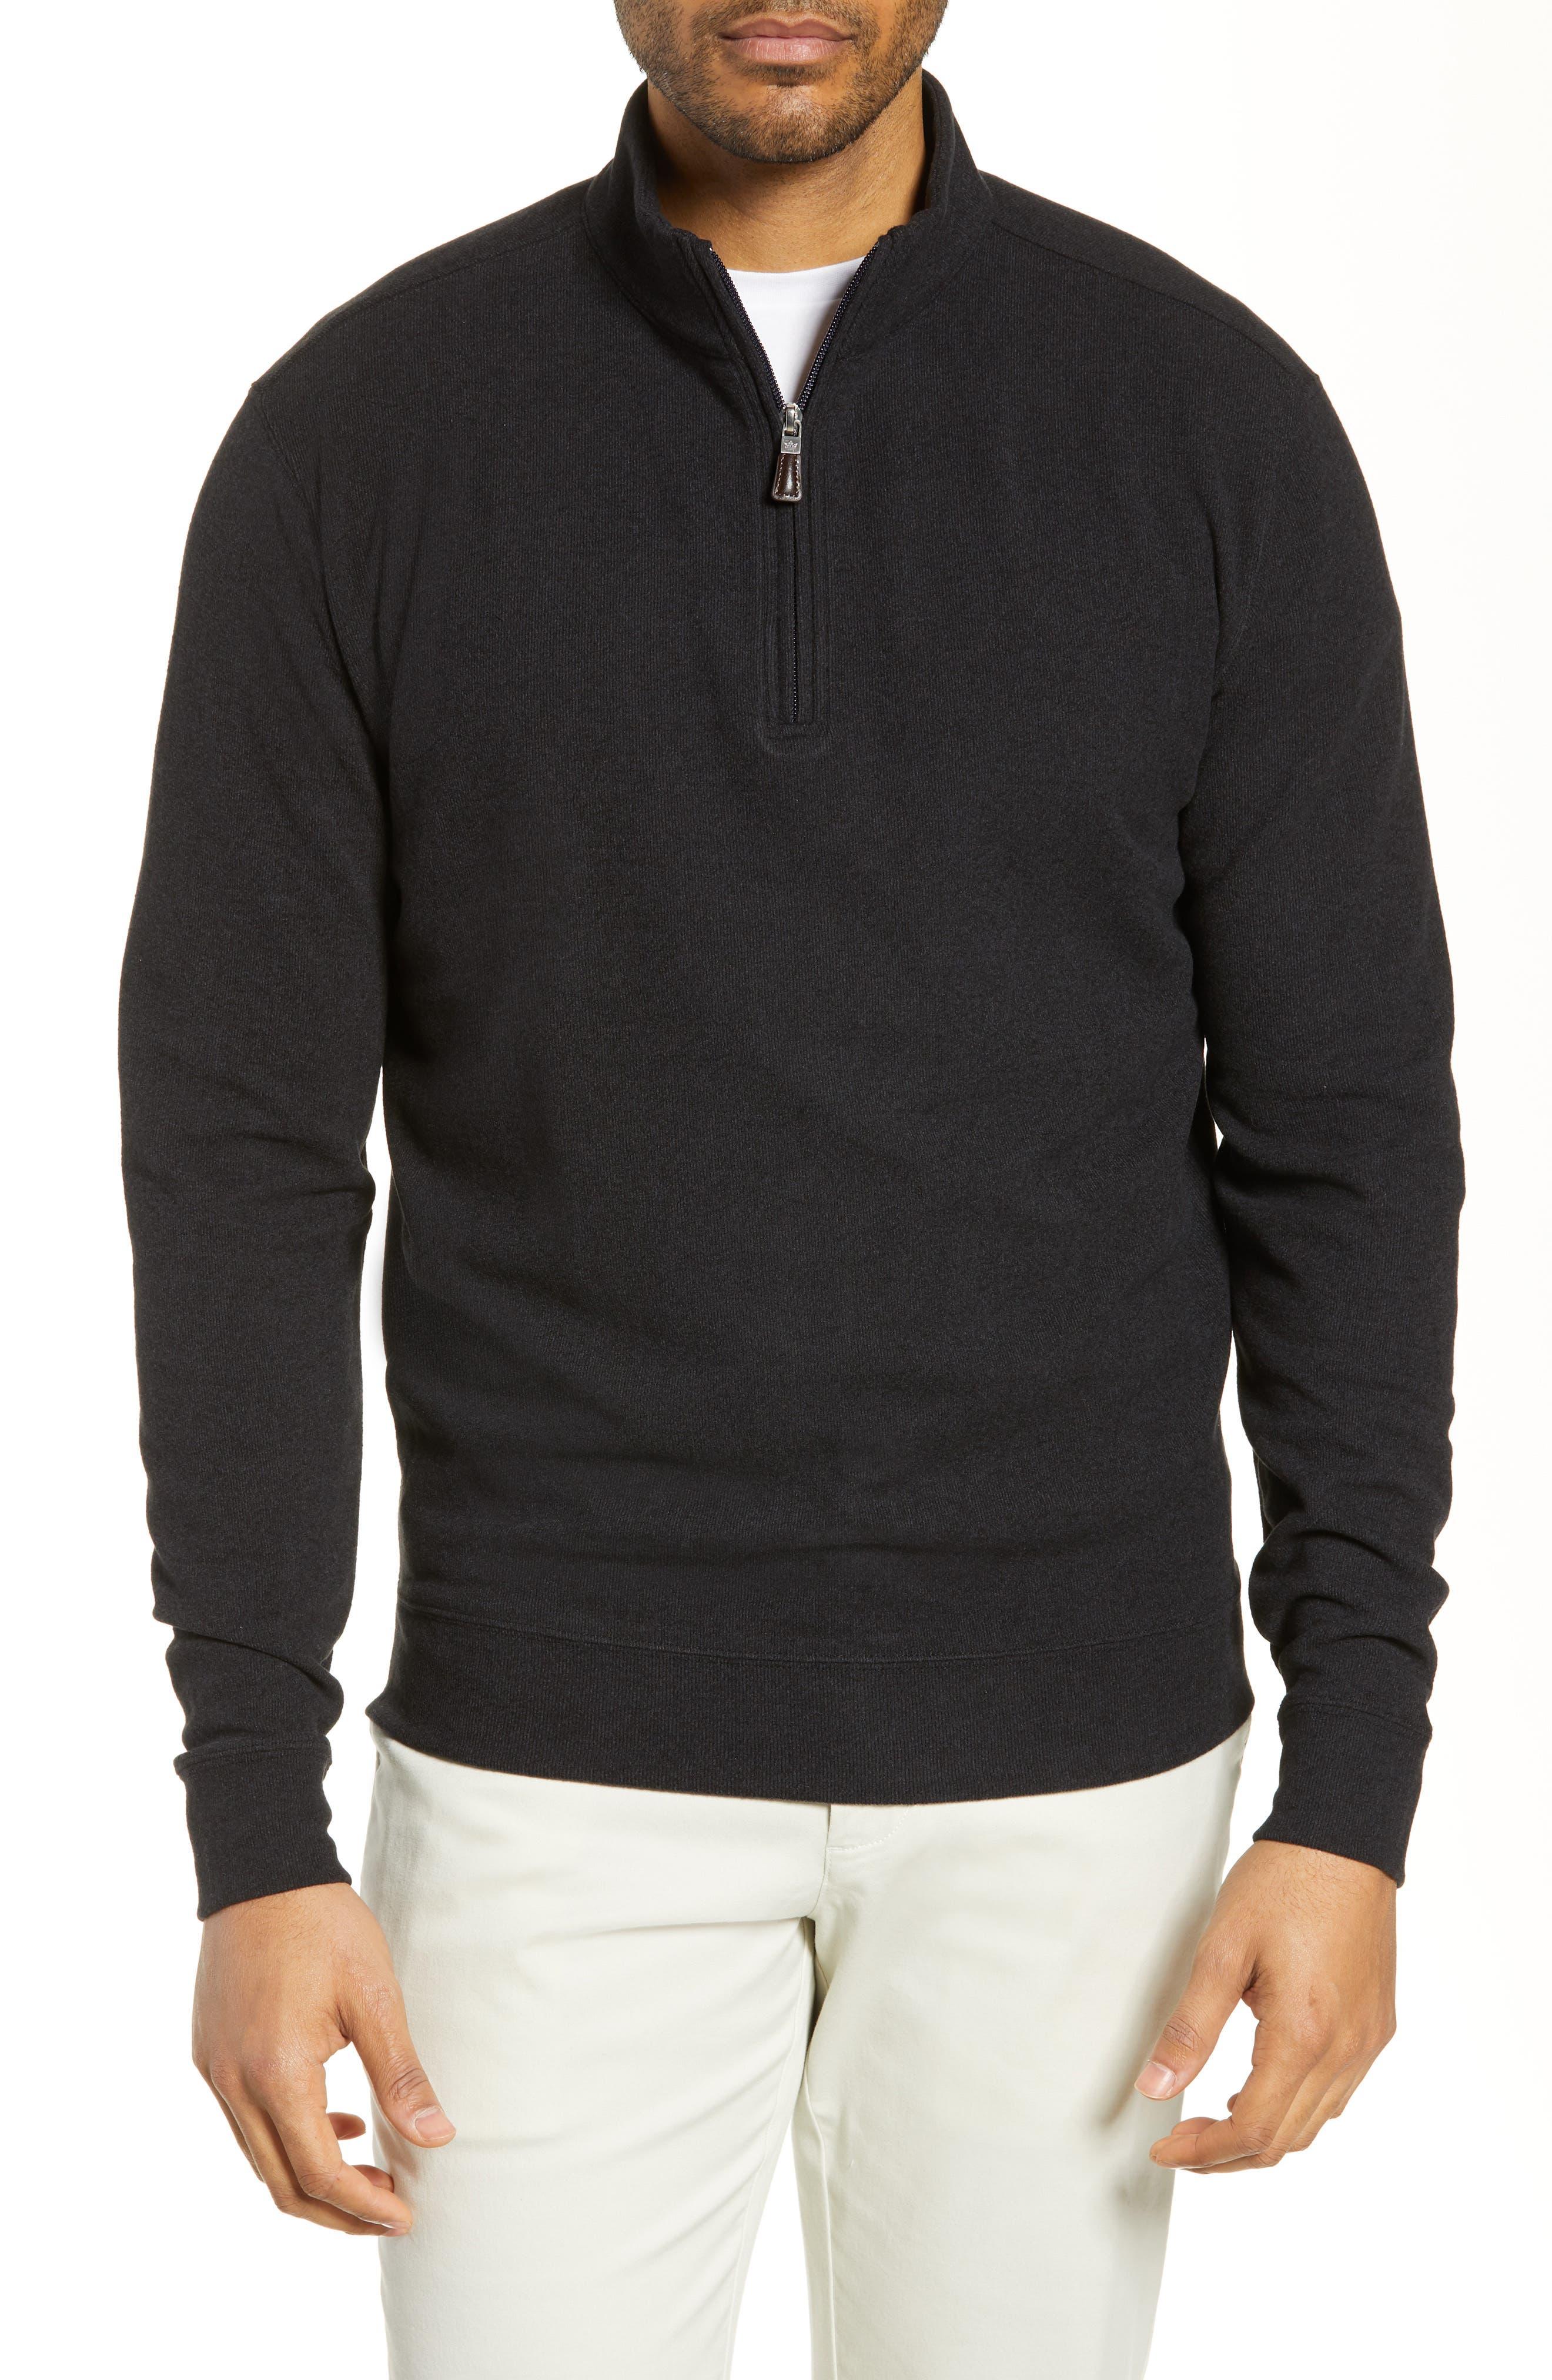 PETER MILLAR, Half Zip Pullover, Main thumbnail 1, color, BLACK